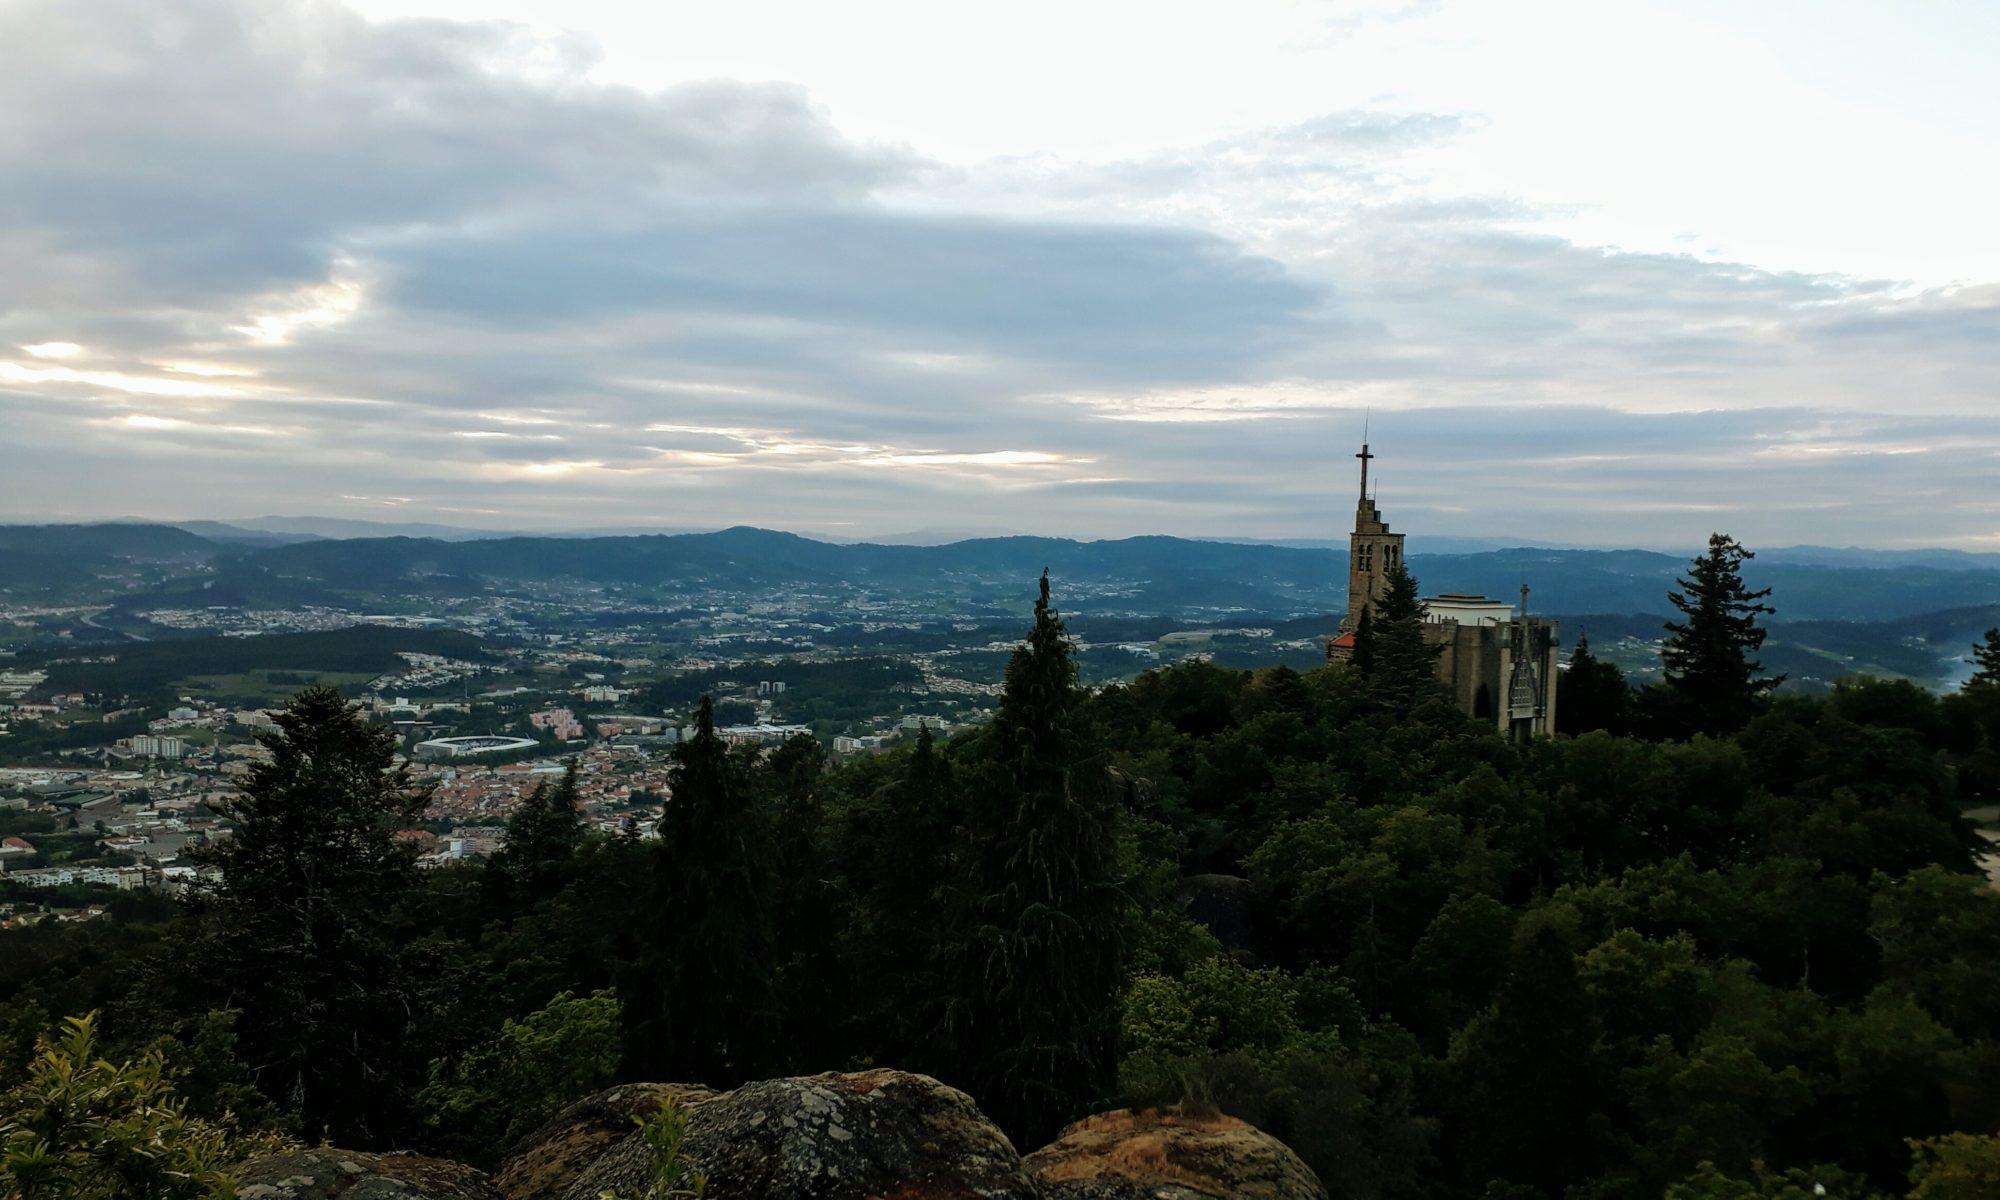 Vista del Santuário da Penha desde la Serra da Penha o Monte de Santa Catarina